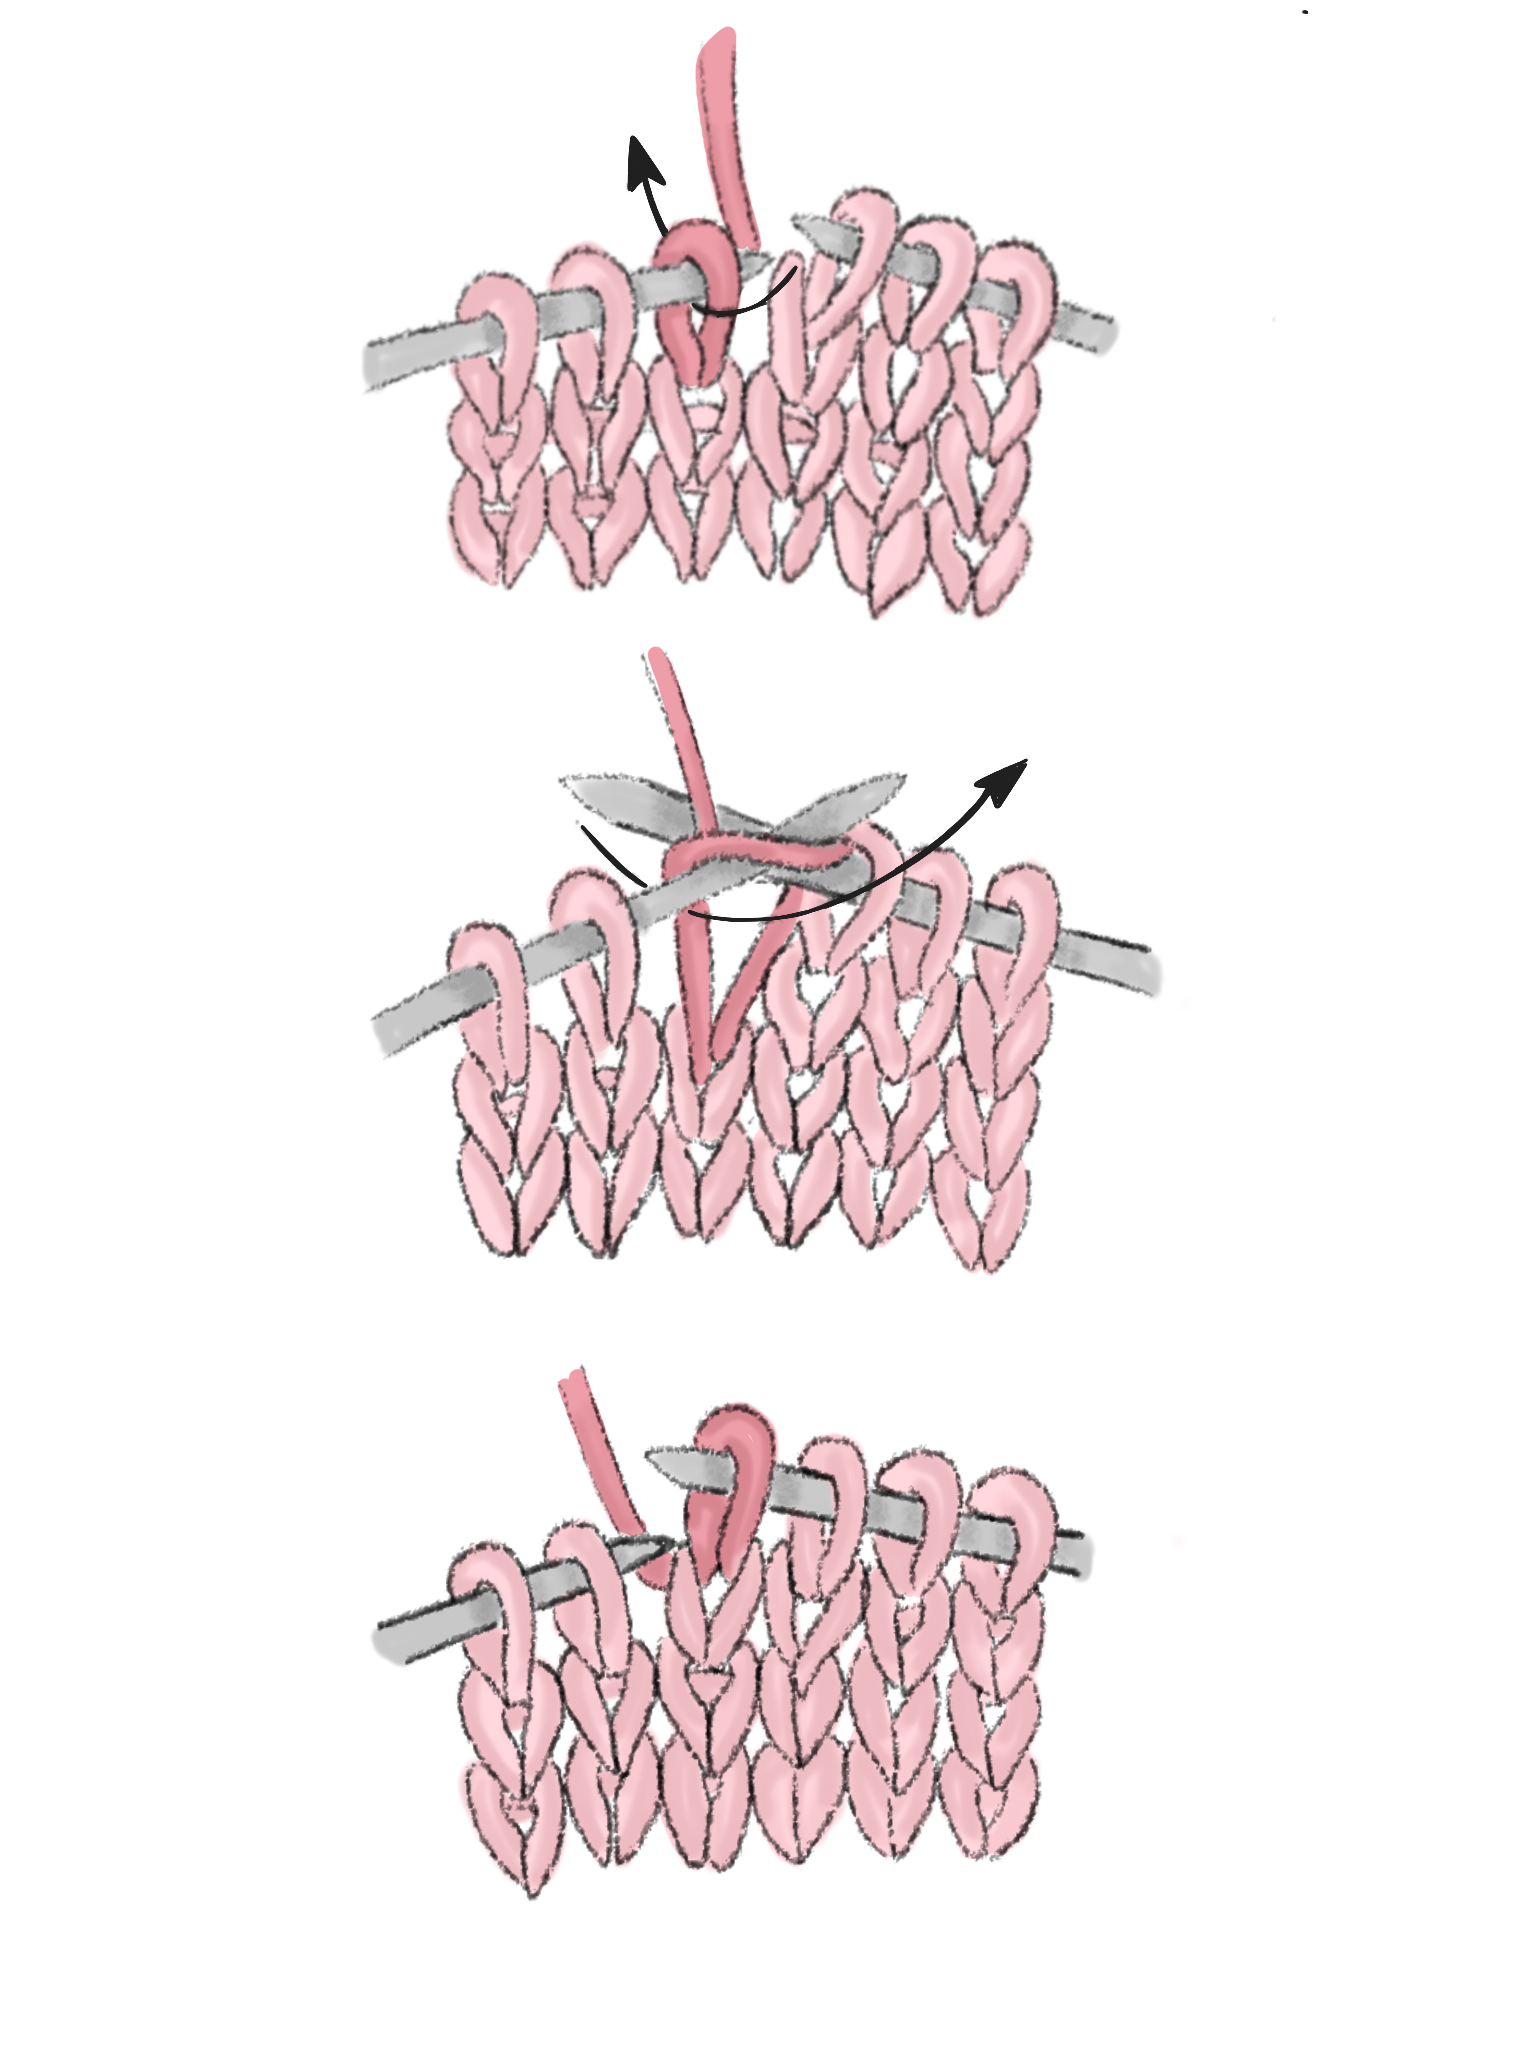 Häkeln vs. Stricken